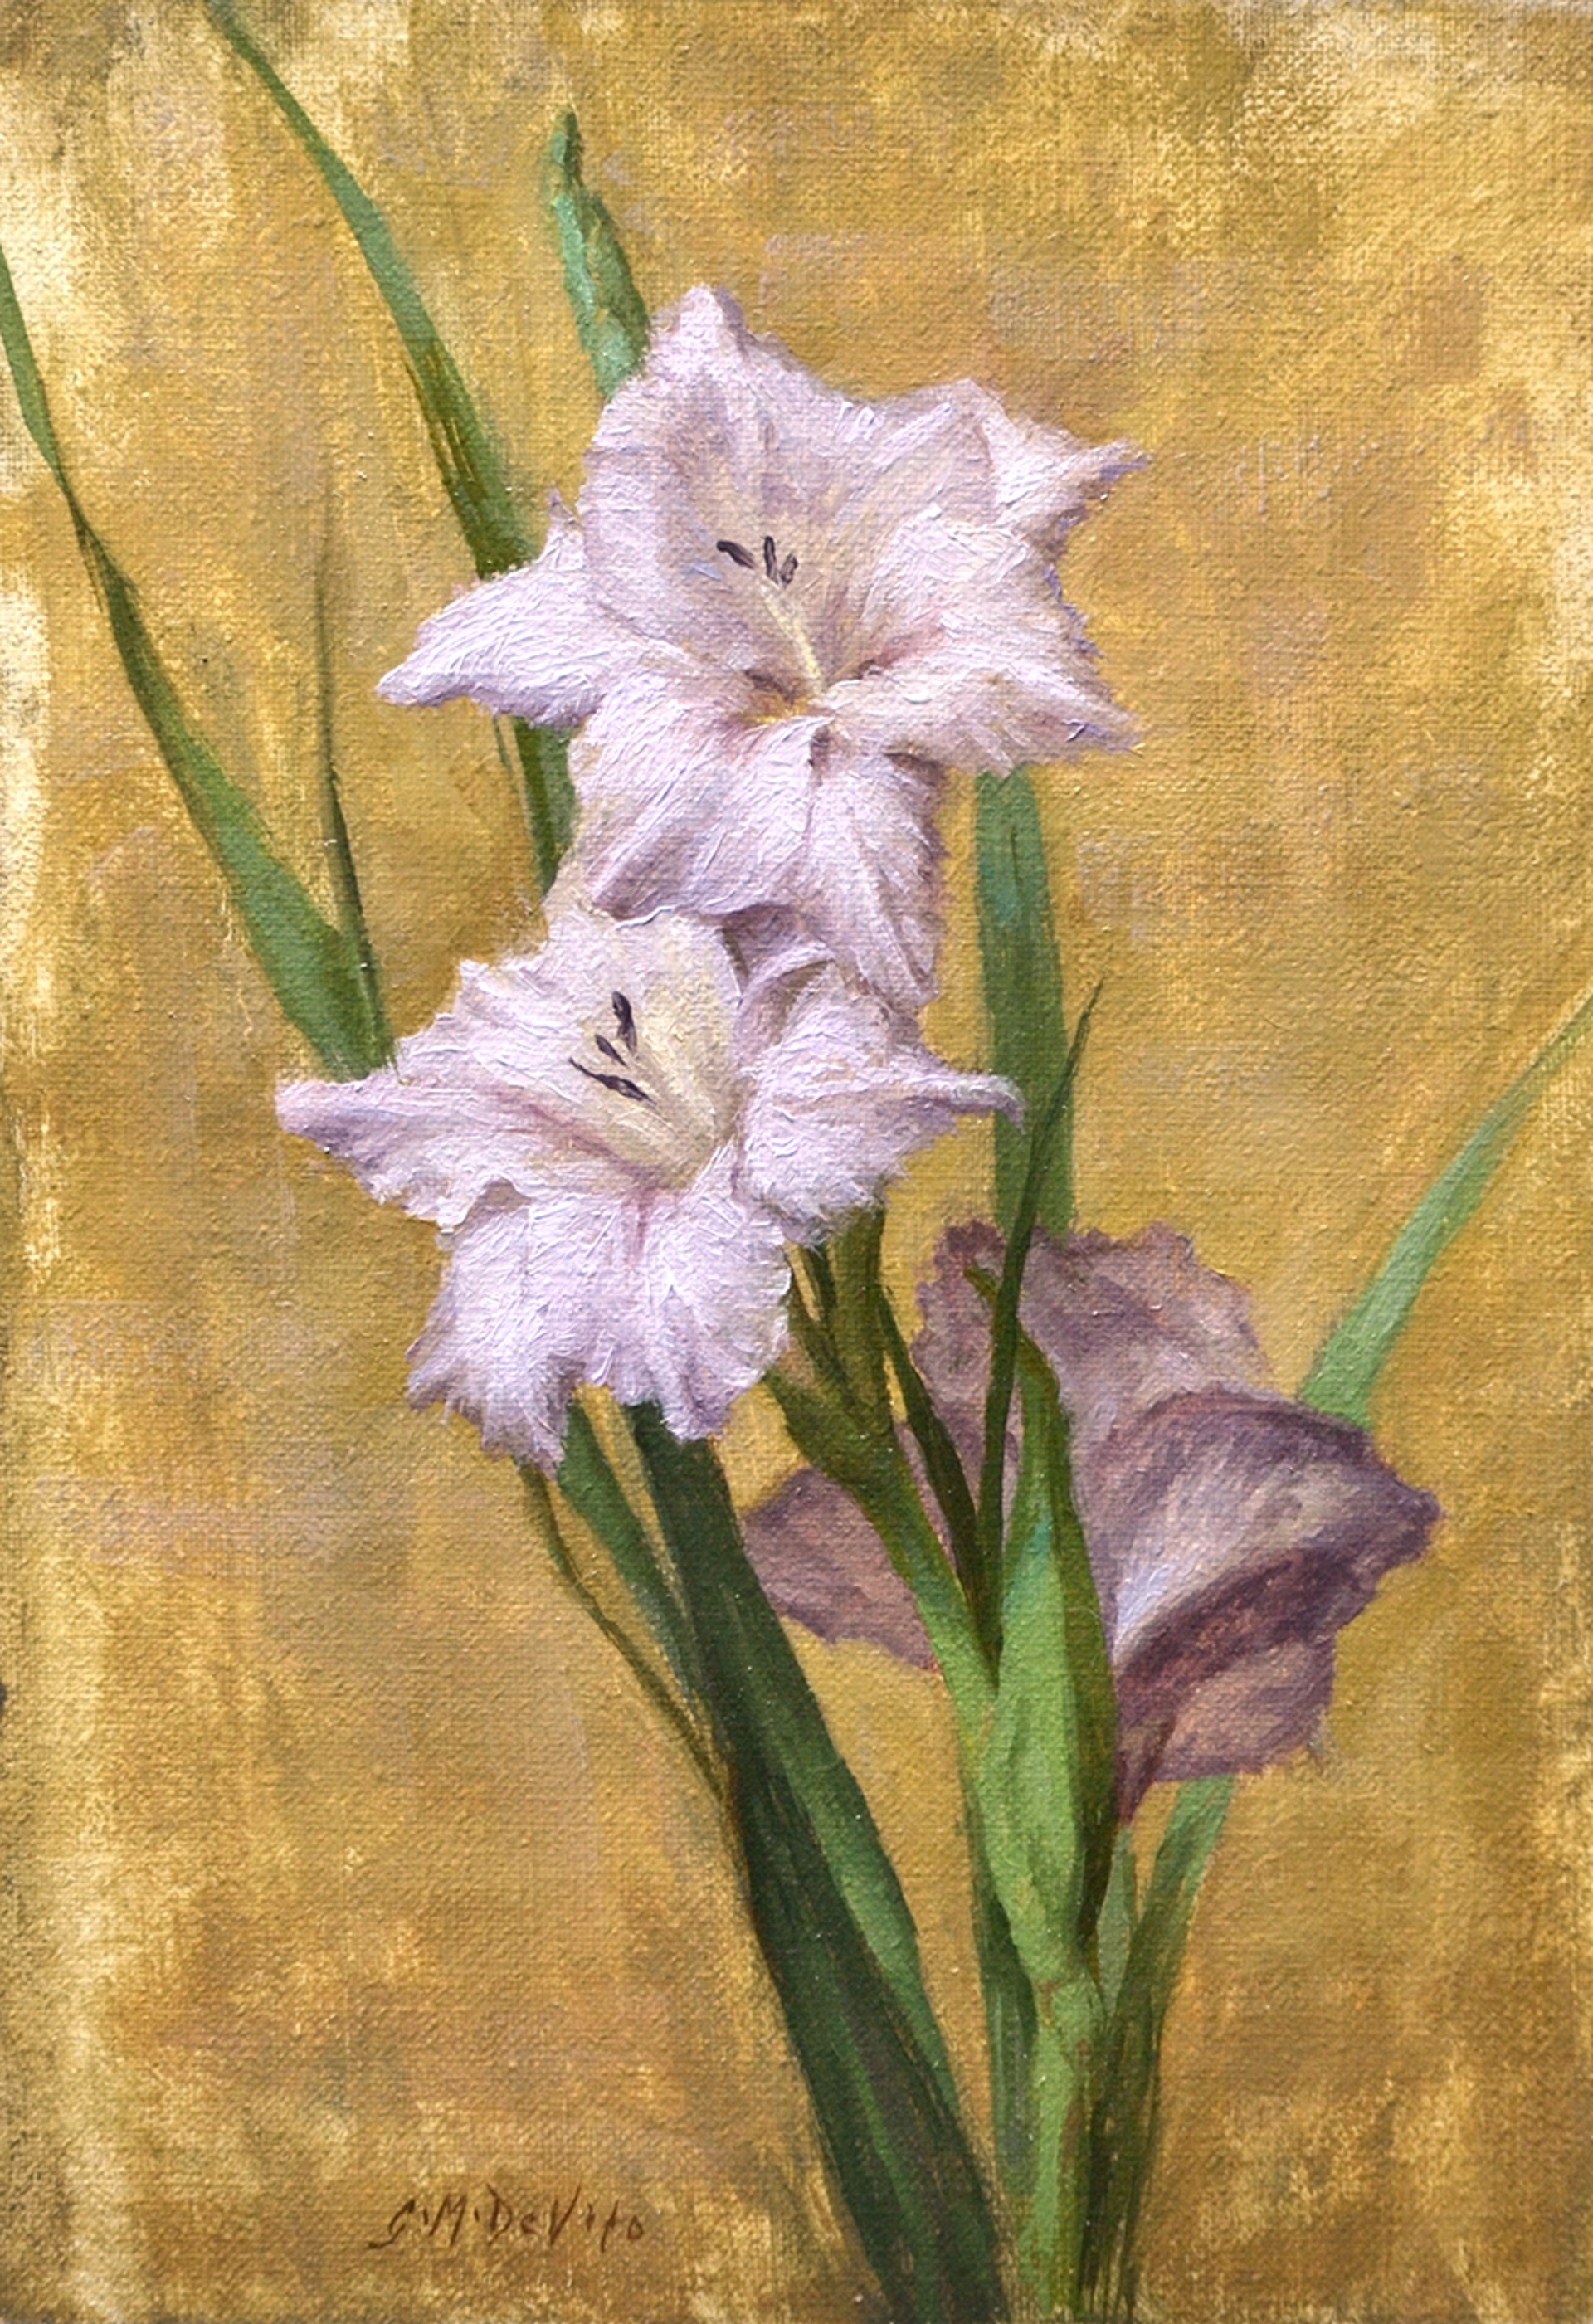 Violet Gladiola by Grace DeVito